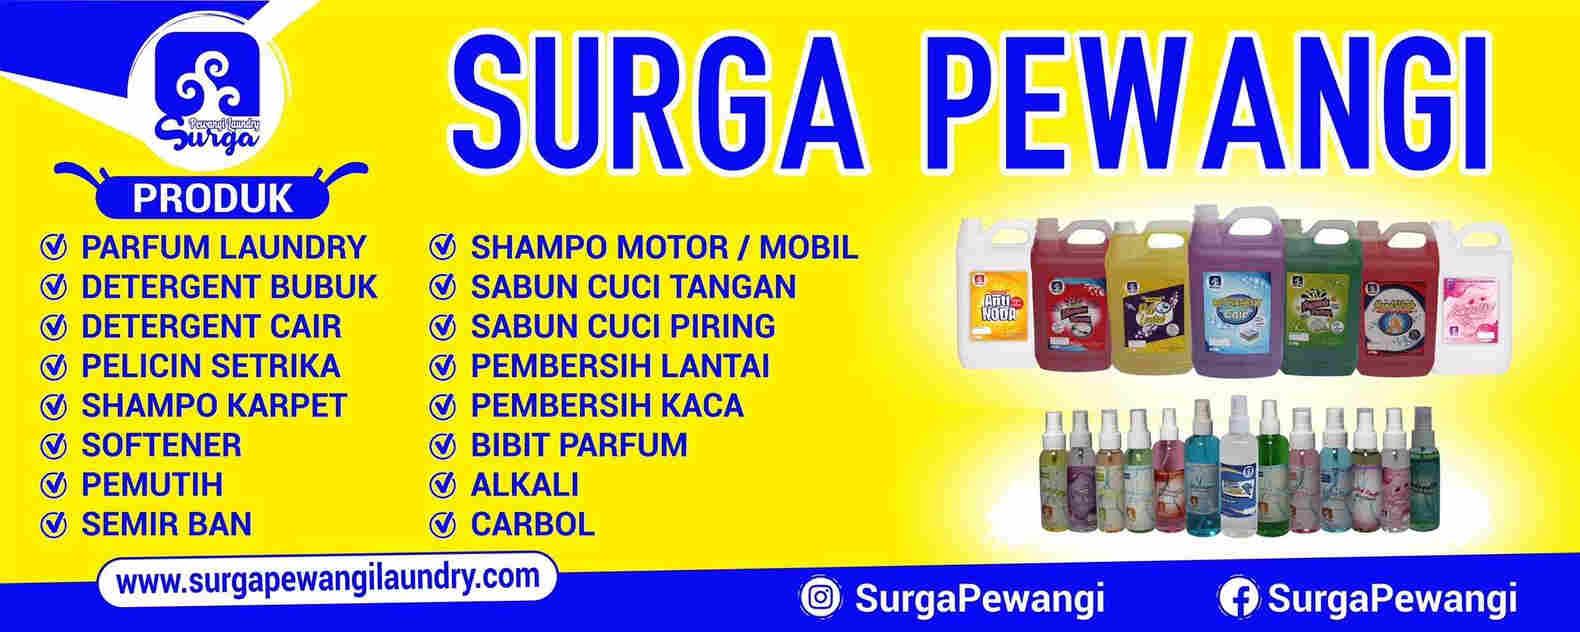 Produsen Parfum Laundry Surabaya